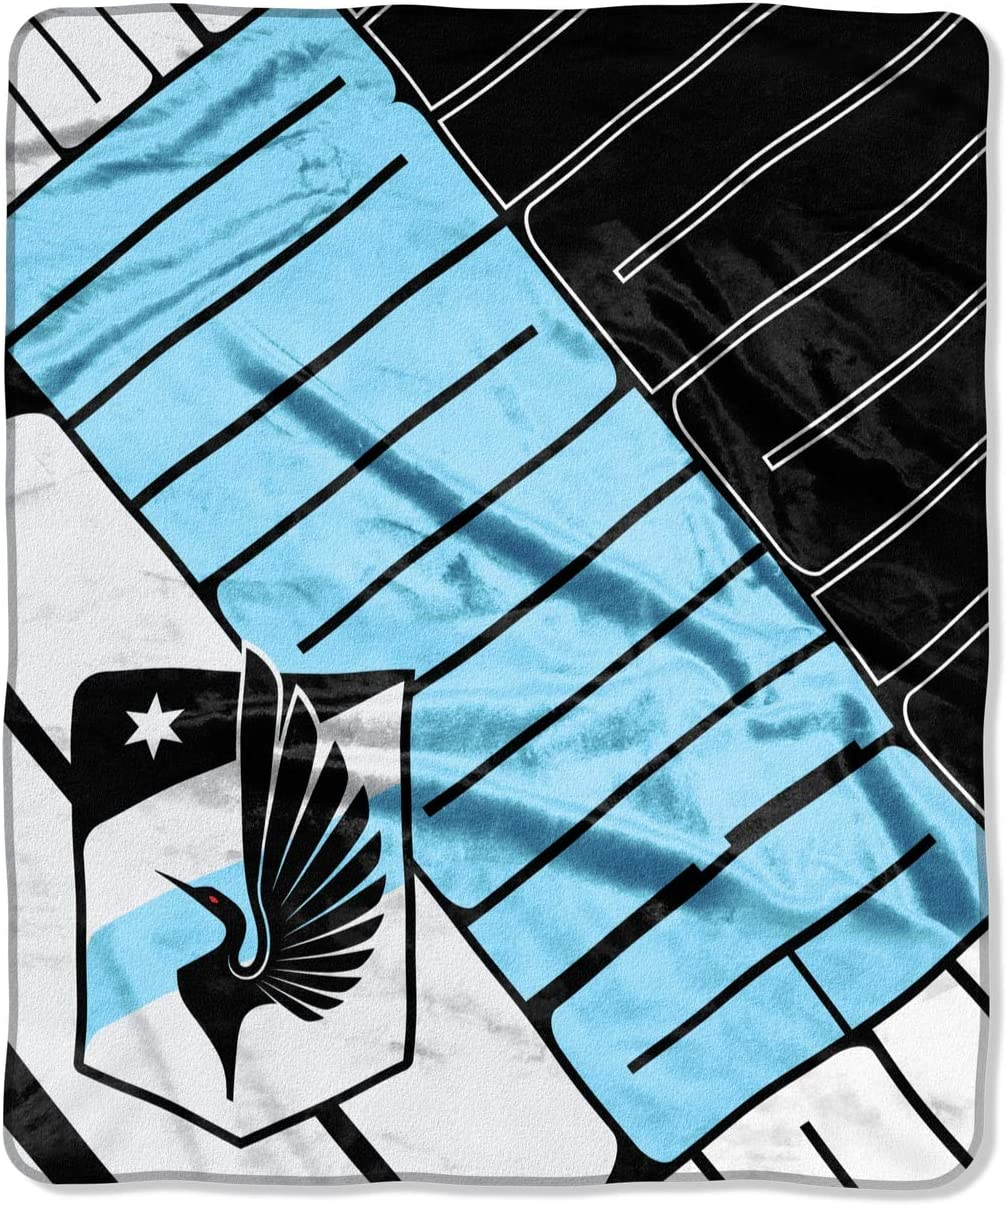 MLS Minnesota United FC Scramble Plush Raschel Throw Blanket Blanket 50 x 60